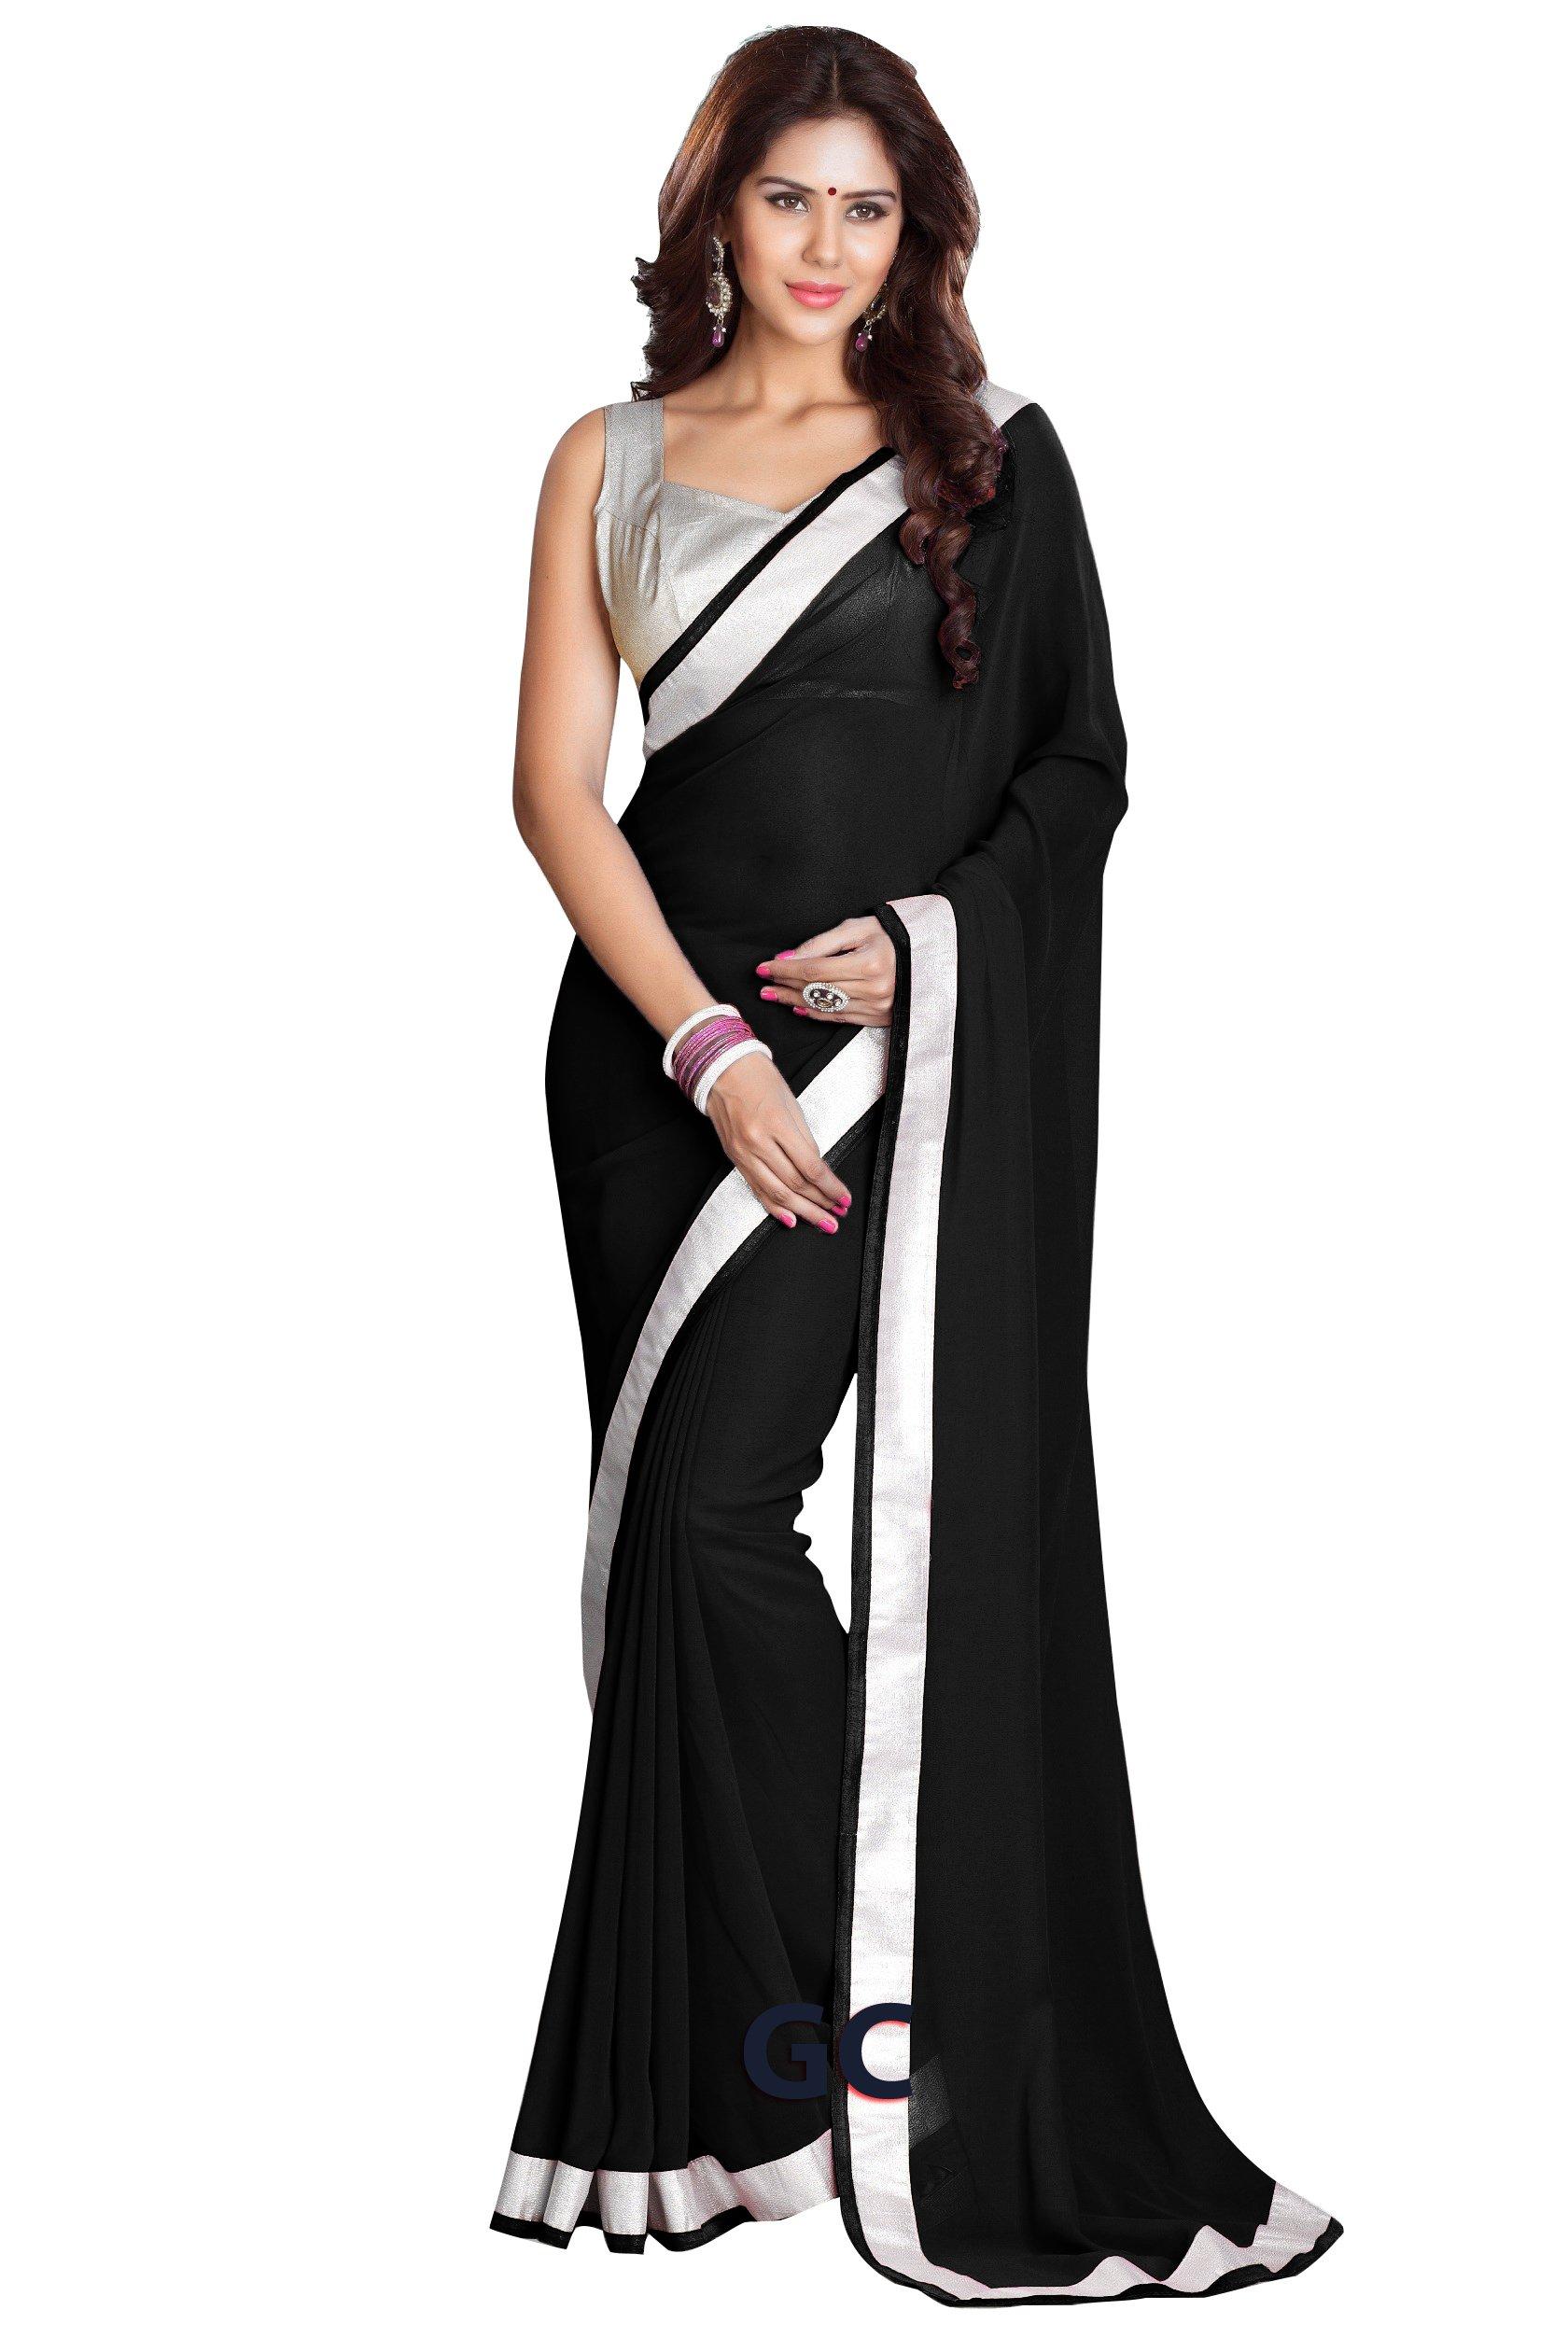 Chiffon Bollywood BellyDance Indian Saree Sari - SB Black by BombayFashions (Image #1)